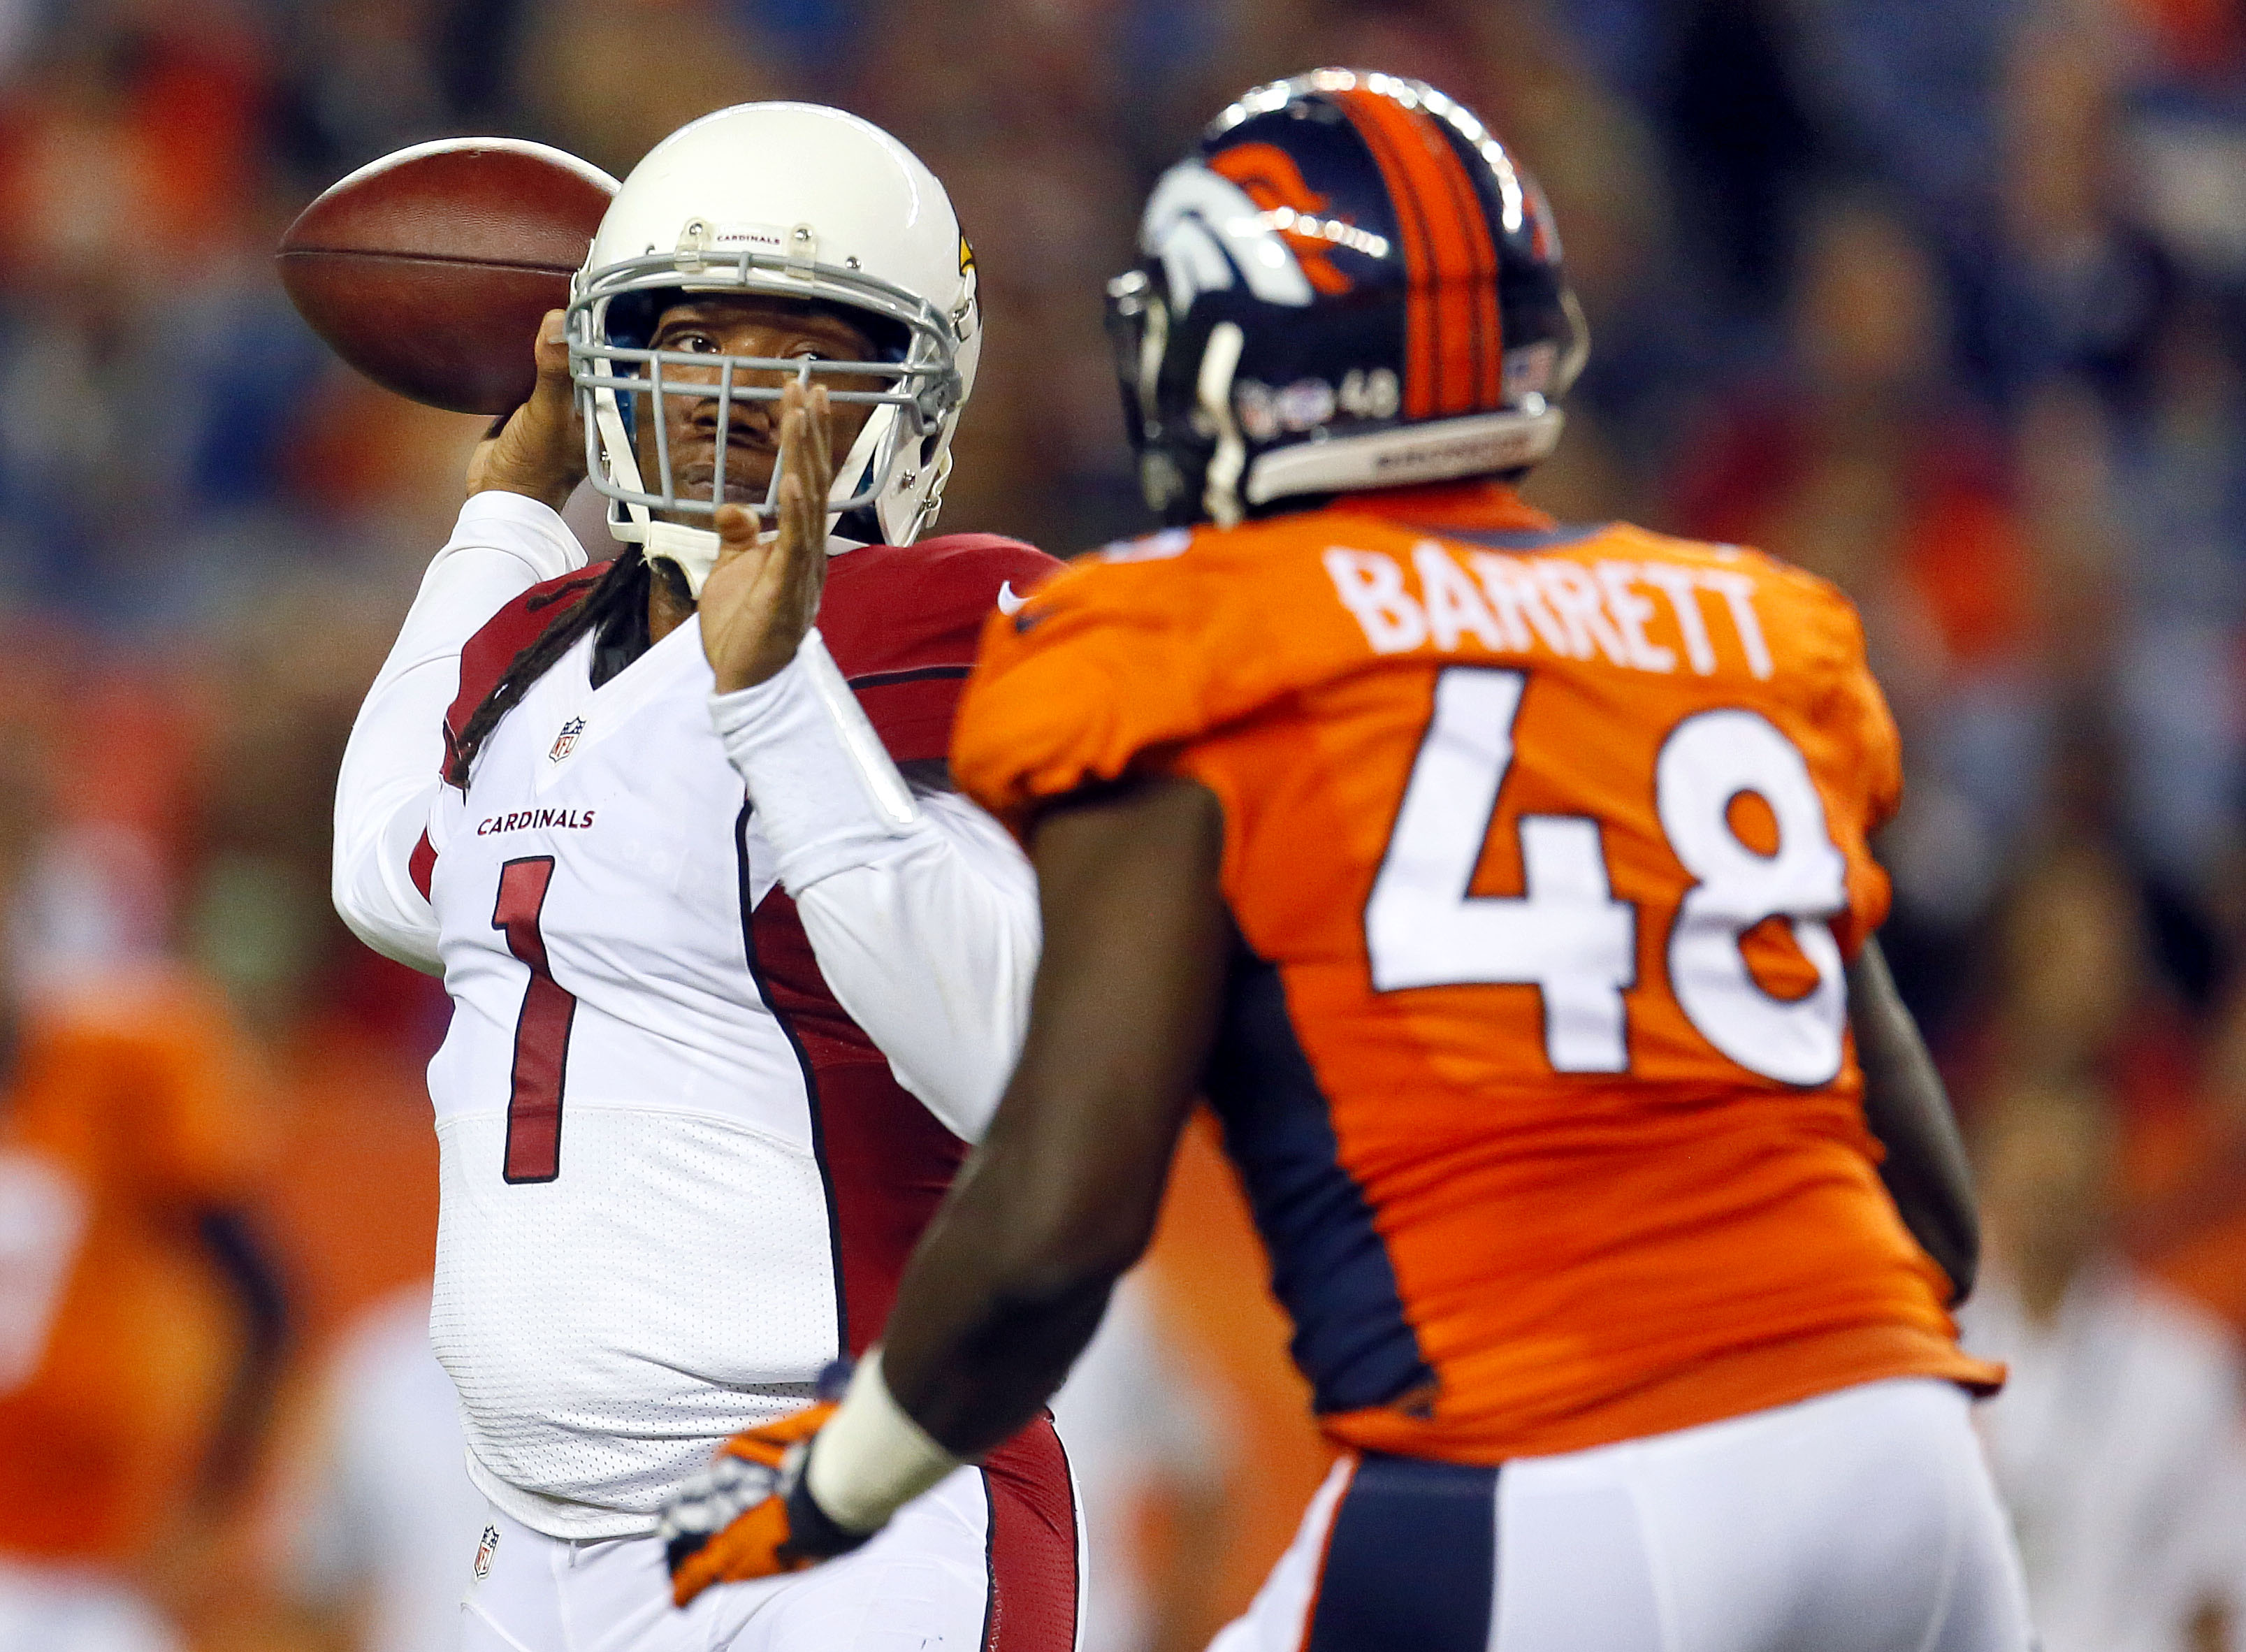 Arizona Cardinals quarterback Phillip Sims (1) throws over Denver Broncos linebacker Shaquil Barrett (48) during the first half of an NFL preseason football game, Thursday, Sept. 3, 2015, in Denver. (AP Photo/Joe Mahoney)